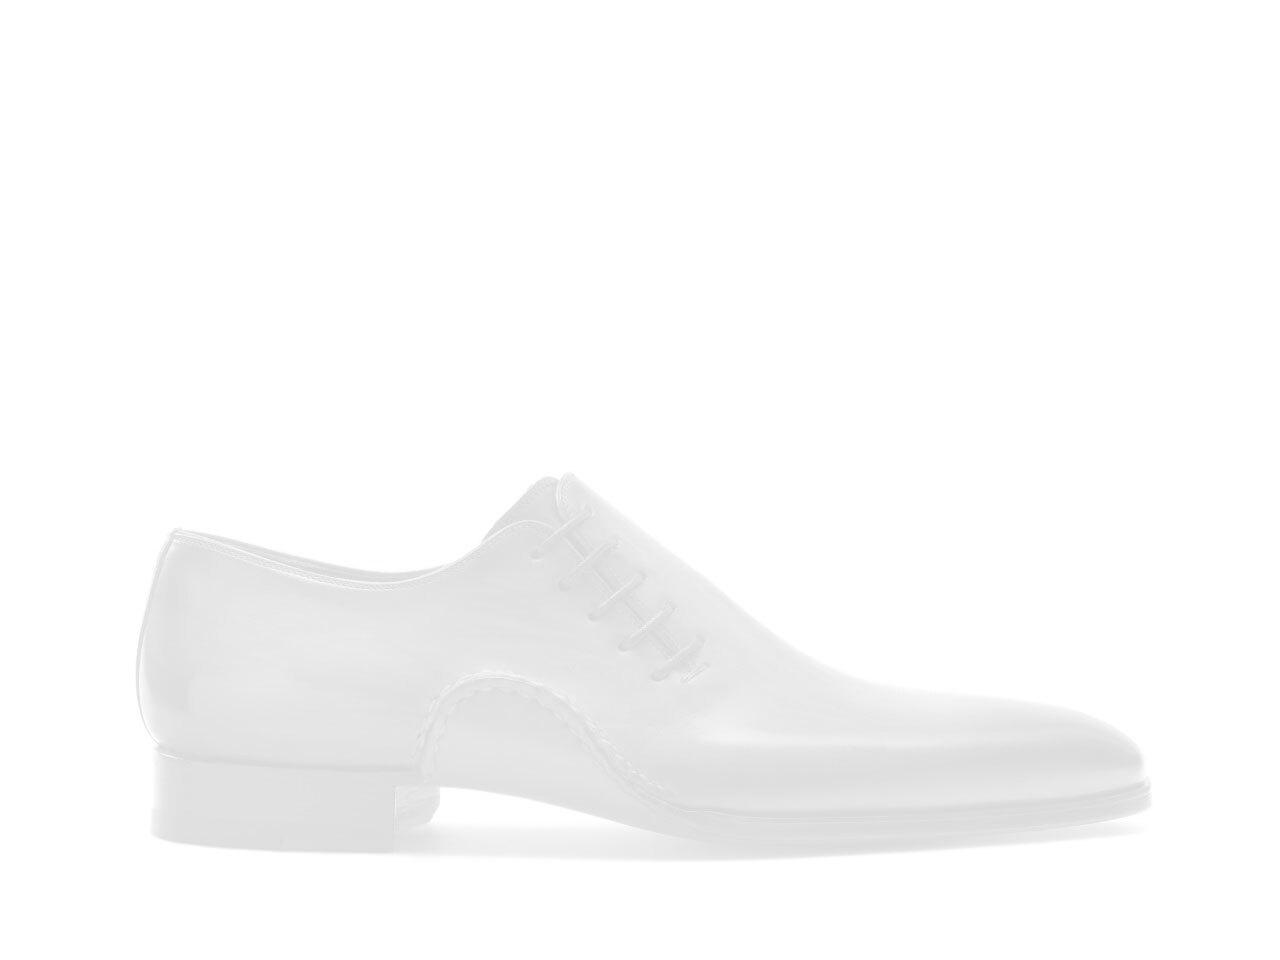 Pair of the Magnanni Pechina Midbrown Men's High Top Sneakers